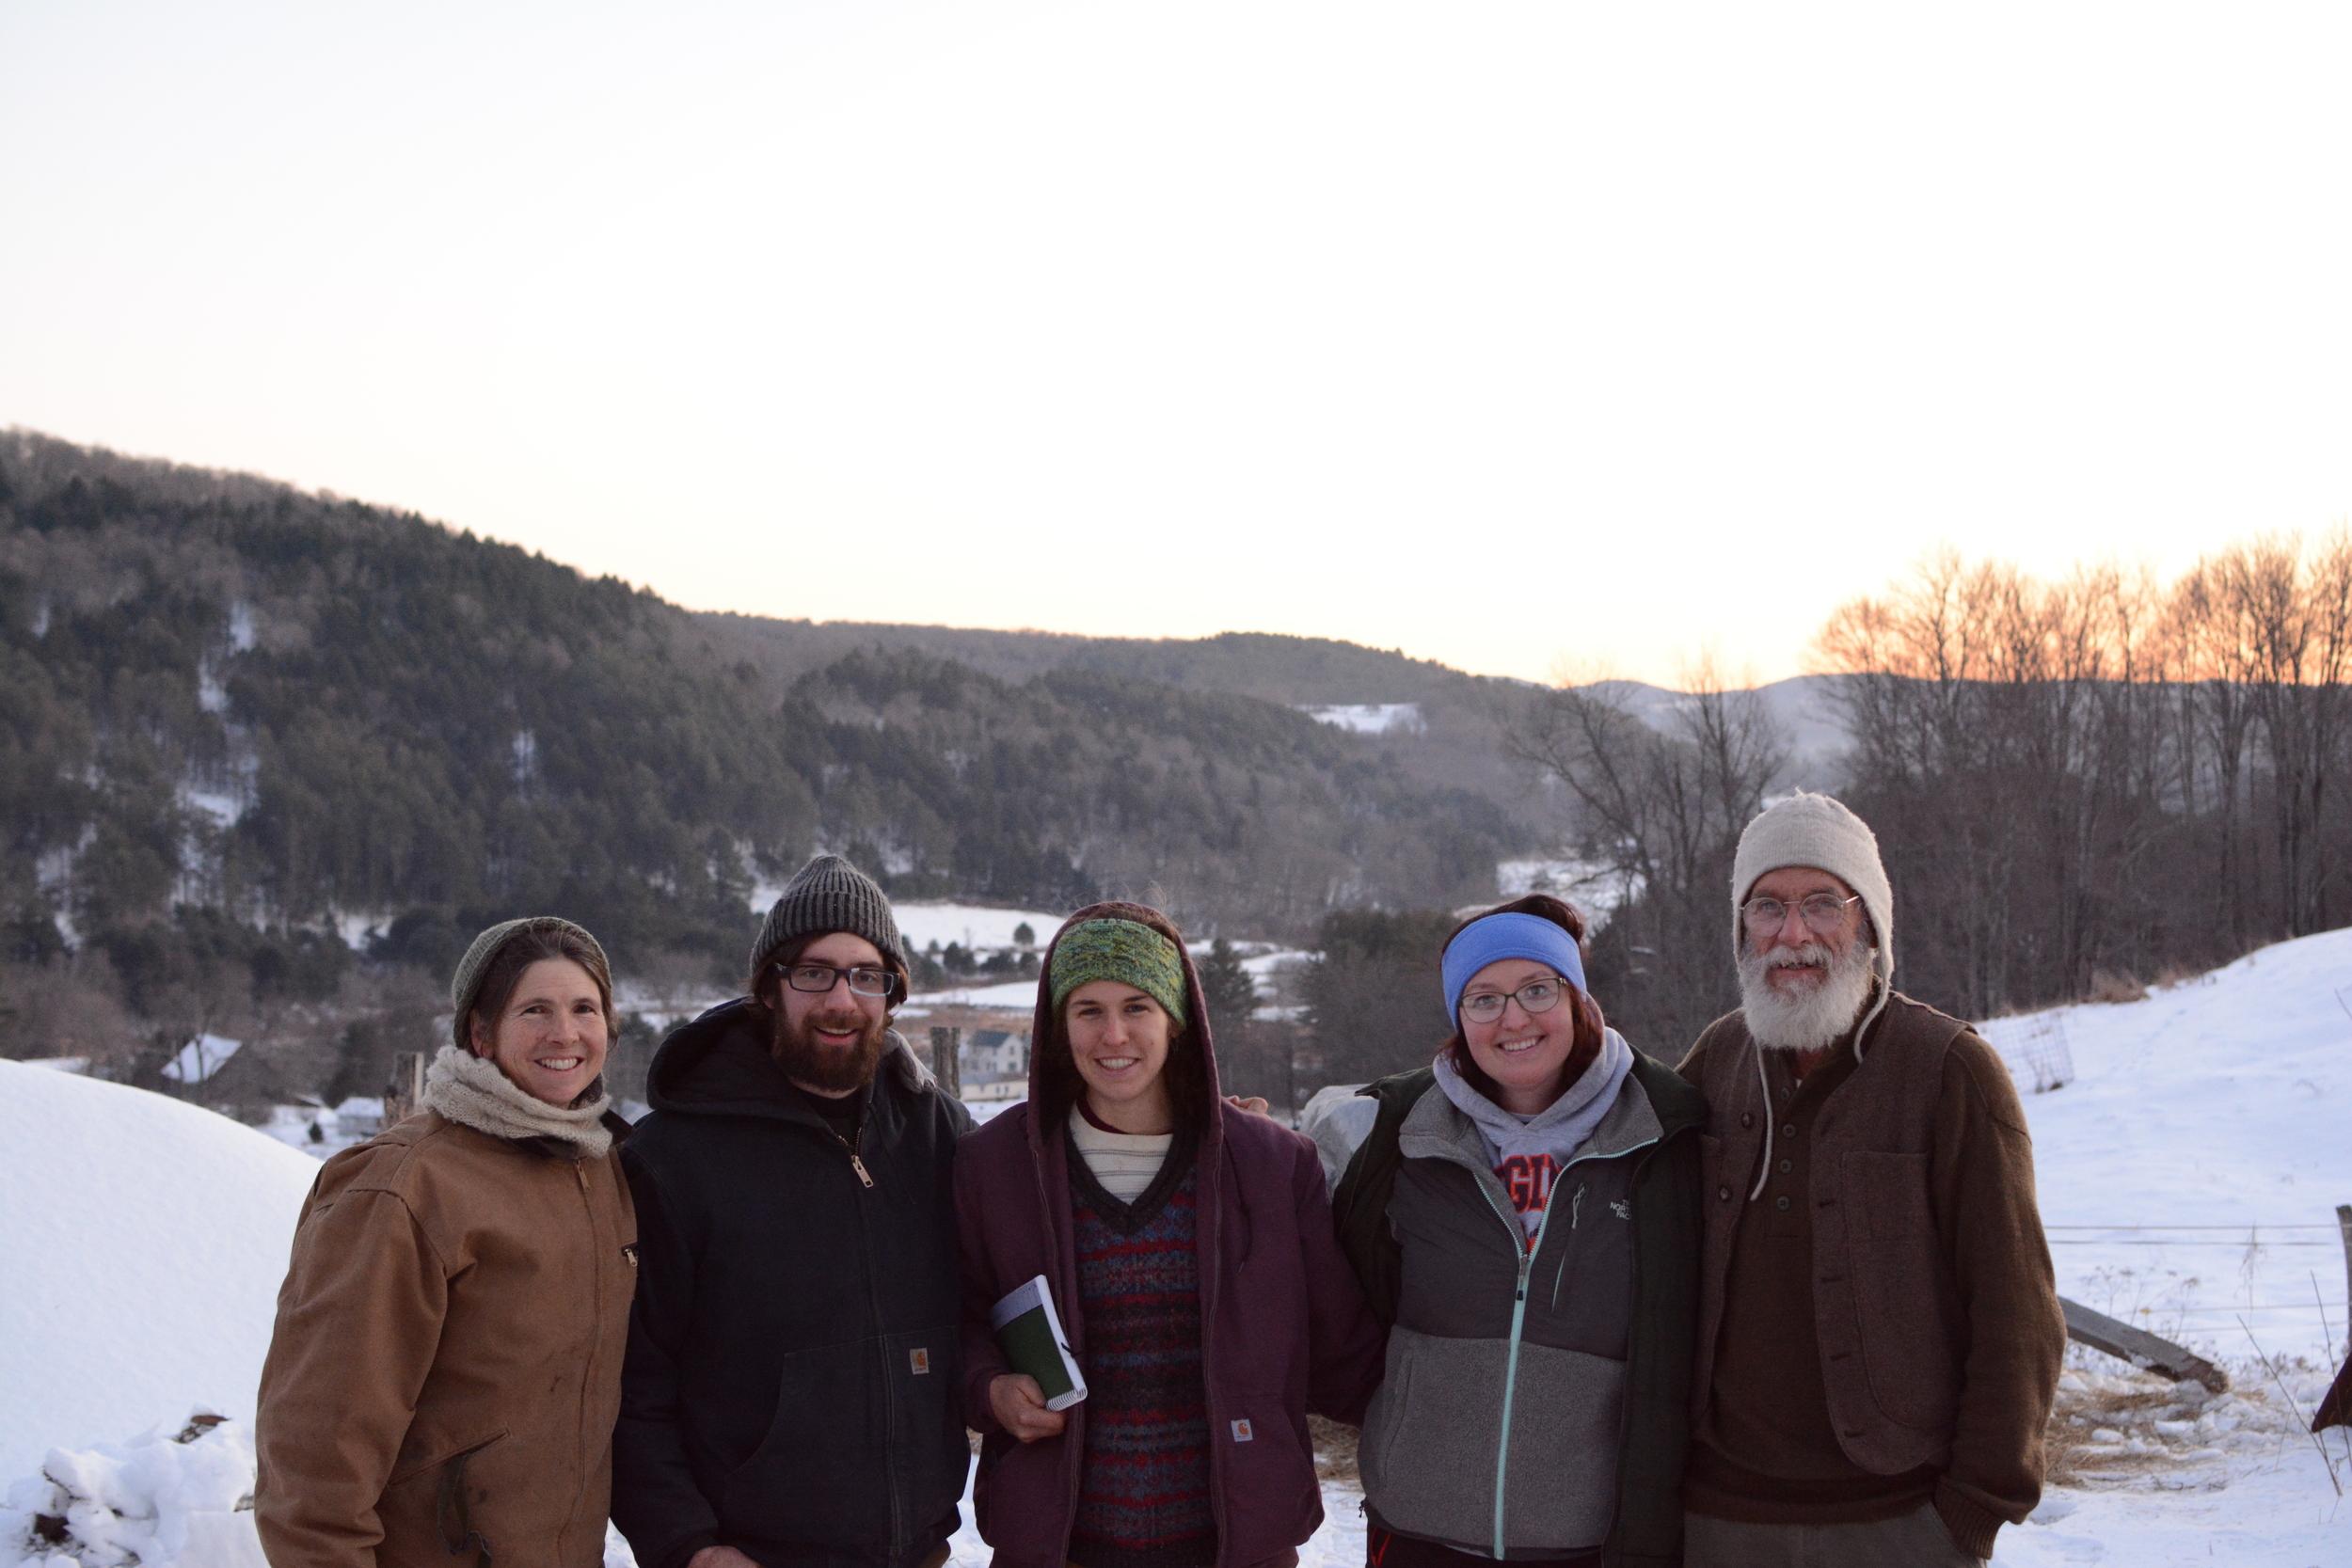 Our friends at Sunny Hill Farm in Randolph, VT